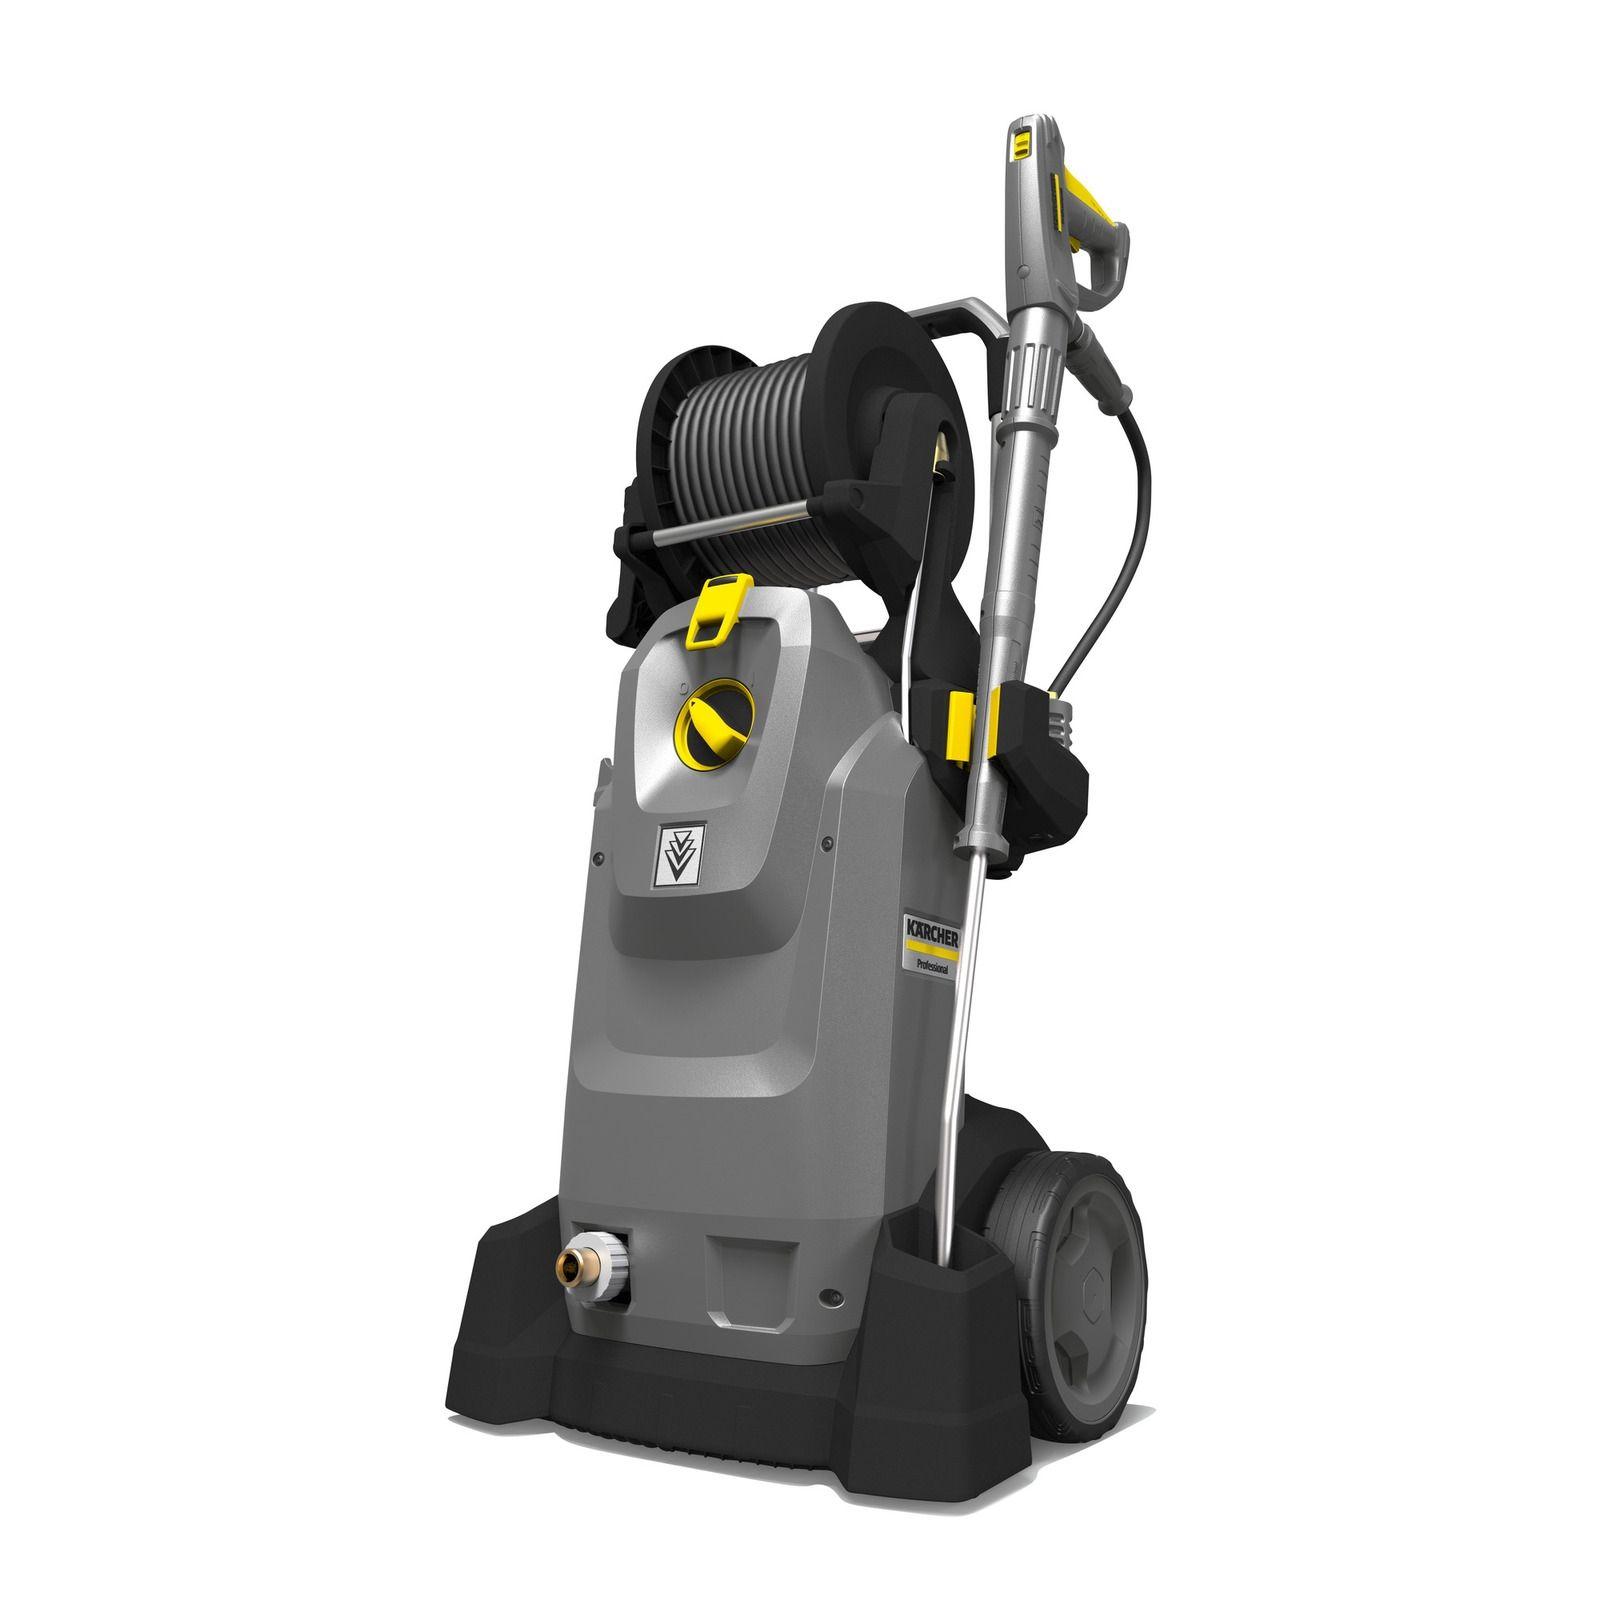 great fit website for discount innovative design Hd 6/15 MX+ Nettoyeur Haute Pression 150Bar 560L/H + buse rotative